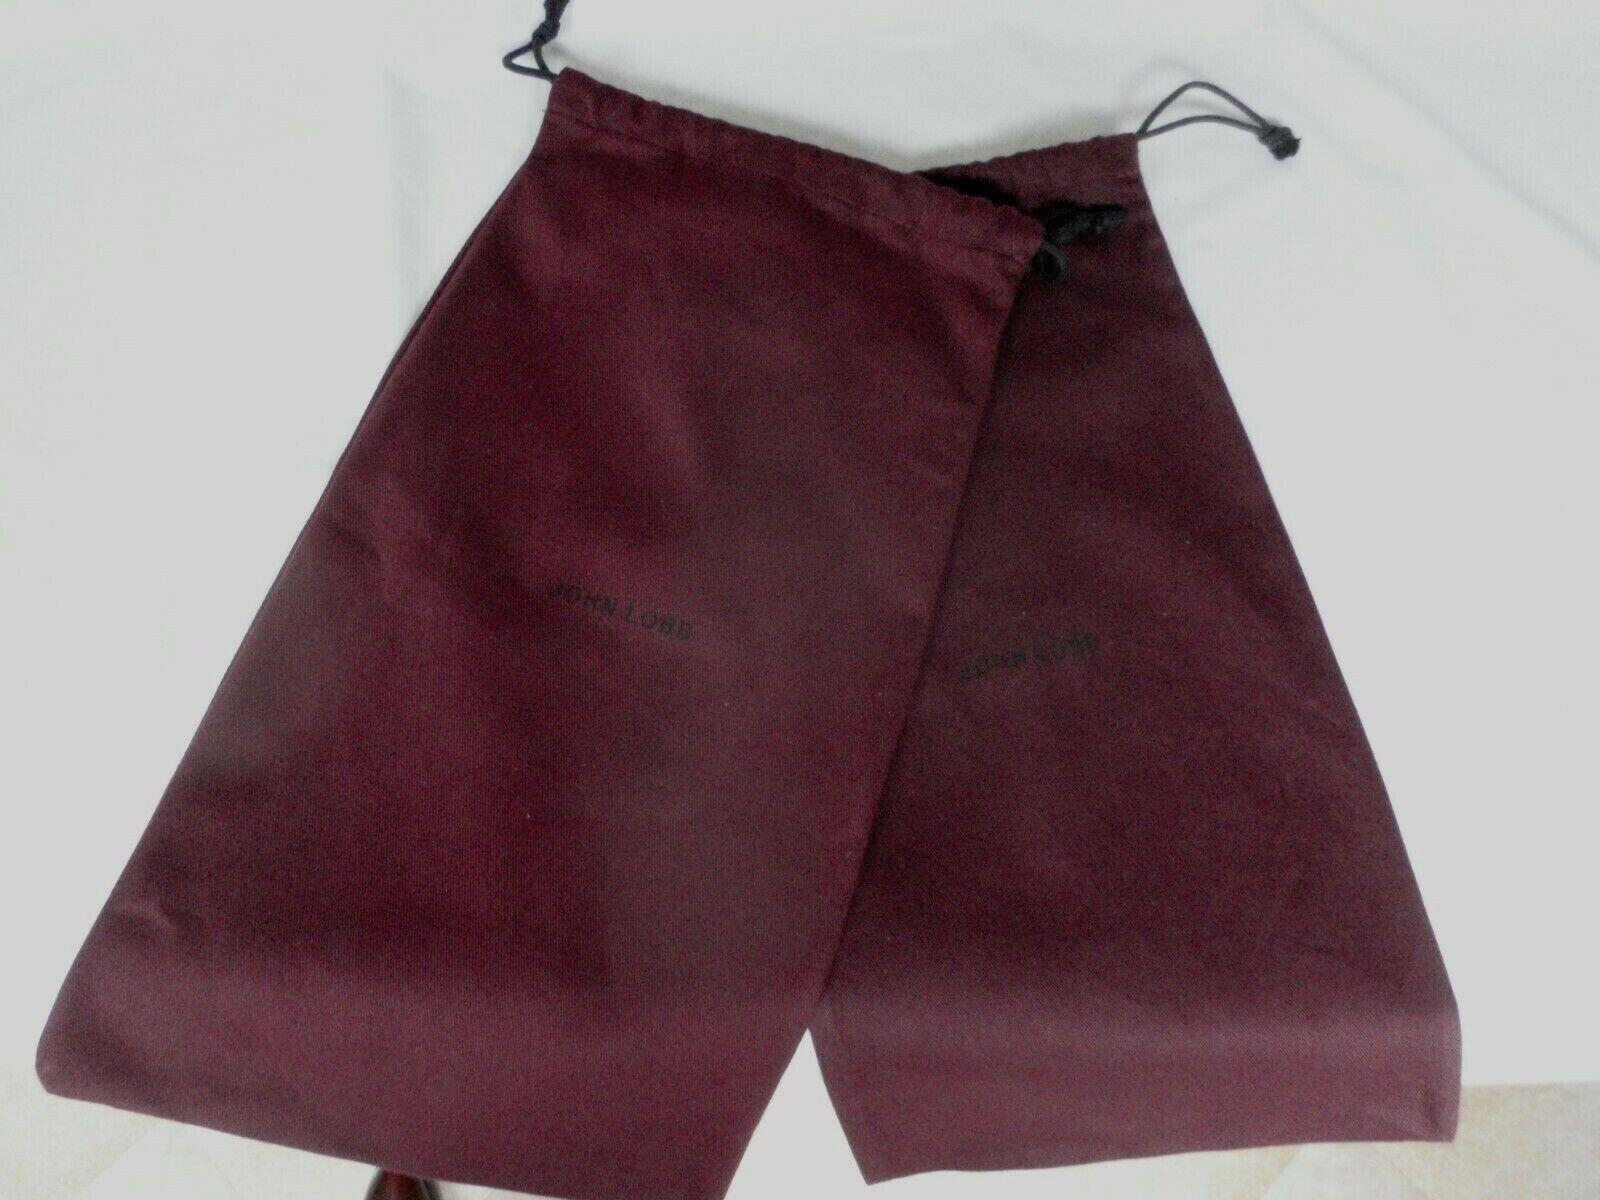 NEW. JOHN LOBB Bootmaker Russet (Red) Cotton Shoe Dustbags Sleeper Bags 1 pair